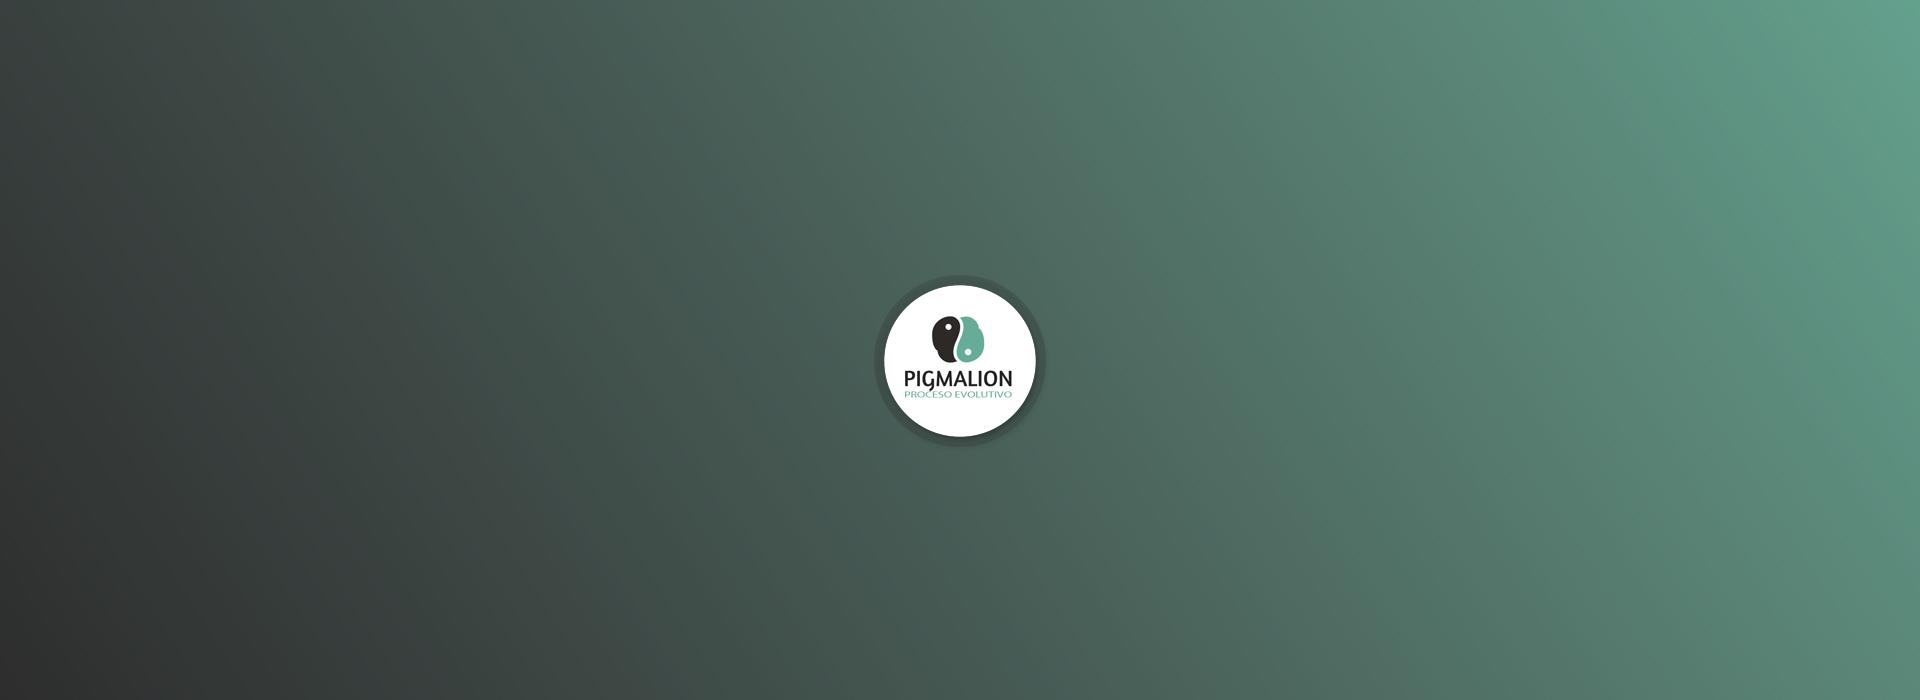 Pigmalion_Banner Principal_V4